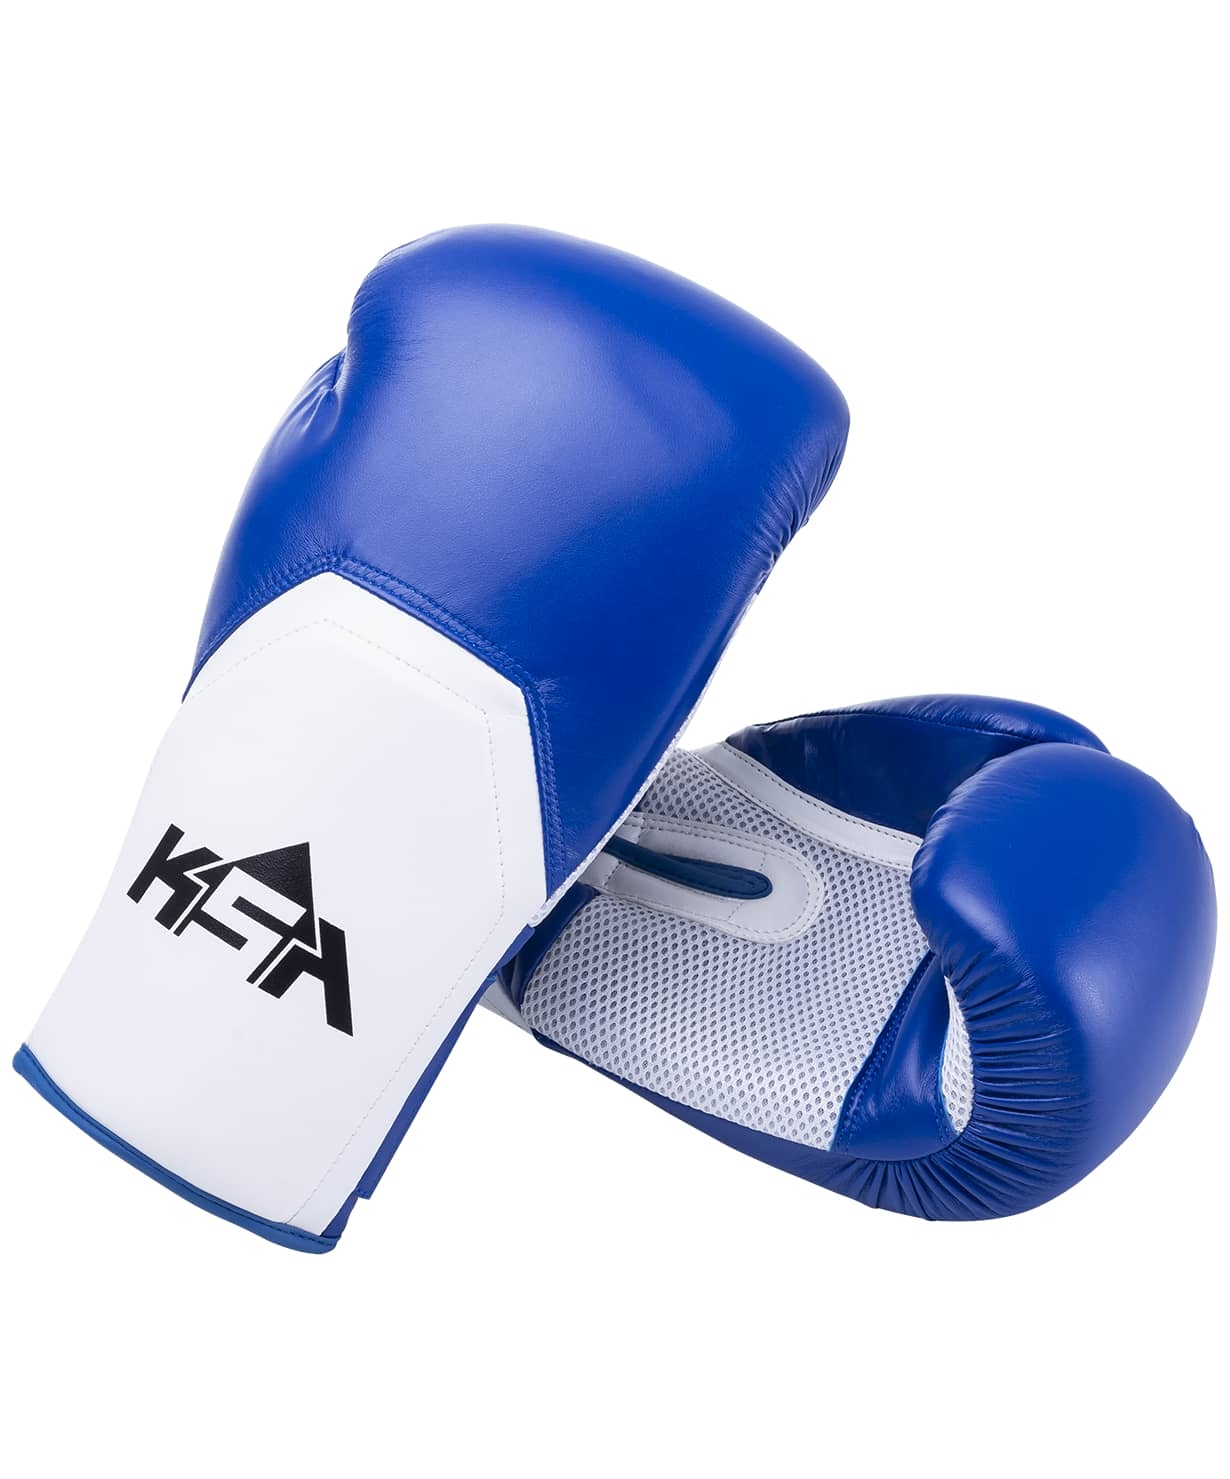 Перчатки боксерские Scorpio Blue, к/з,  8 oz